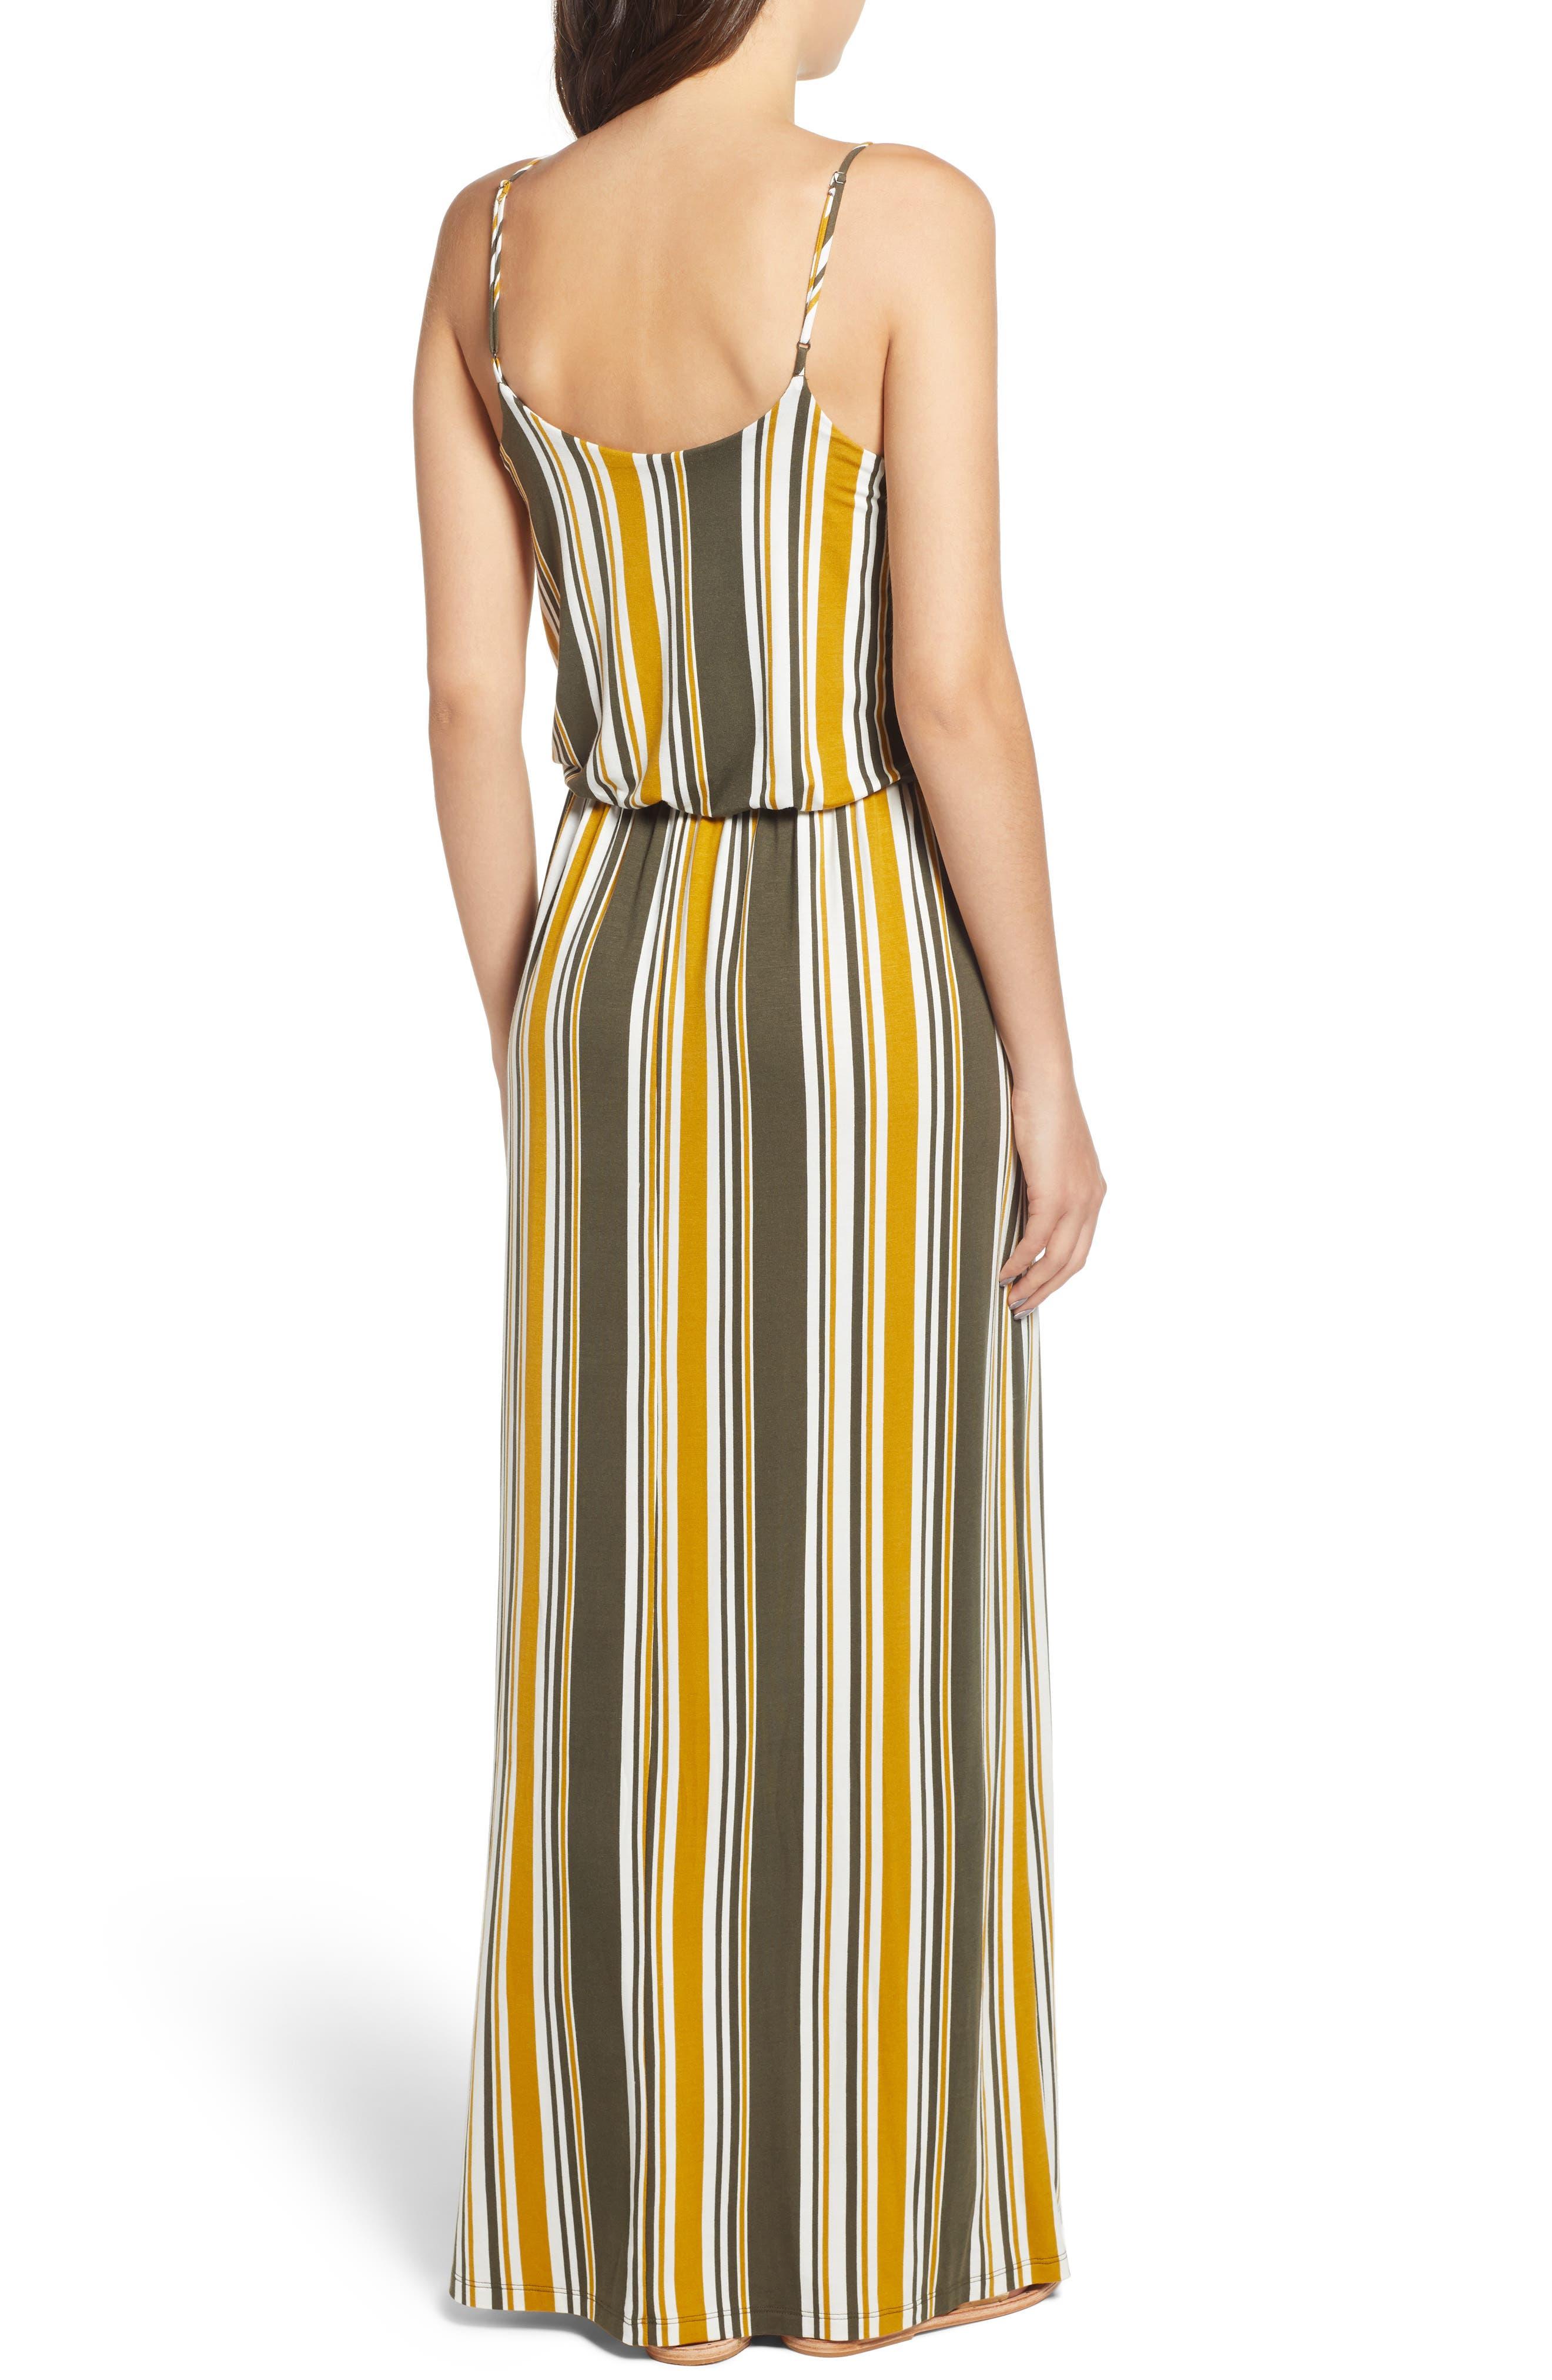 Knit Maxi Dress,                             Alternate thumbnail 2, color,                             ARMY GREEN/ MUSTARD